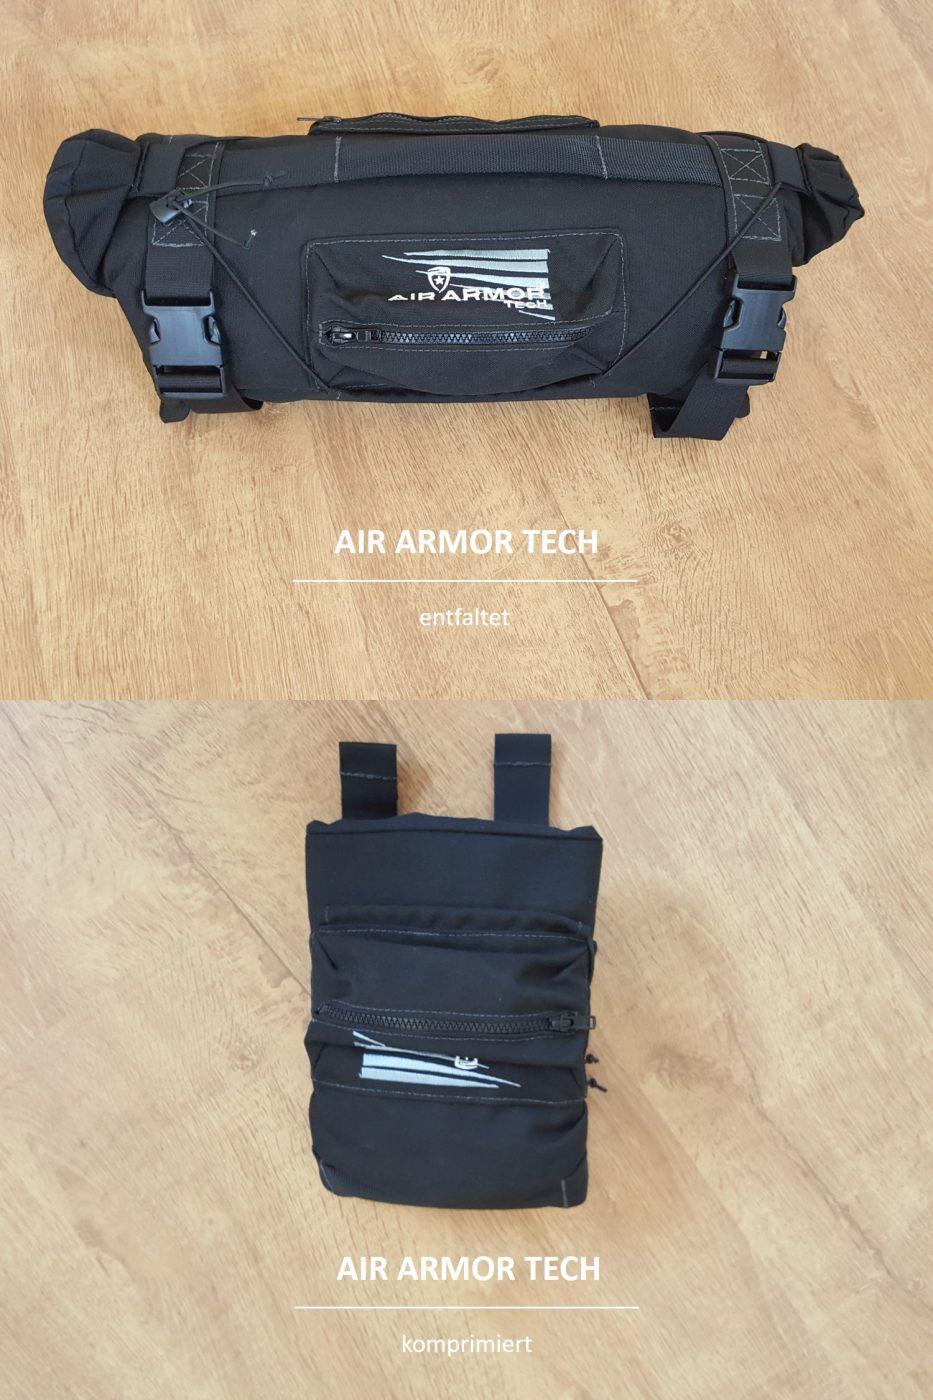 Air Armor Tech Scope Cover entfaltet u. komprimiert